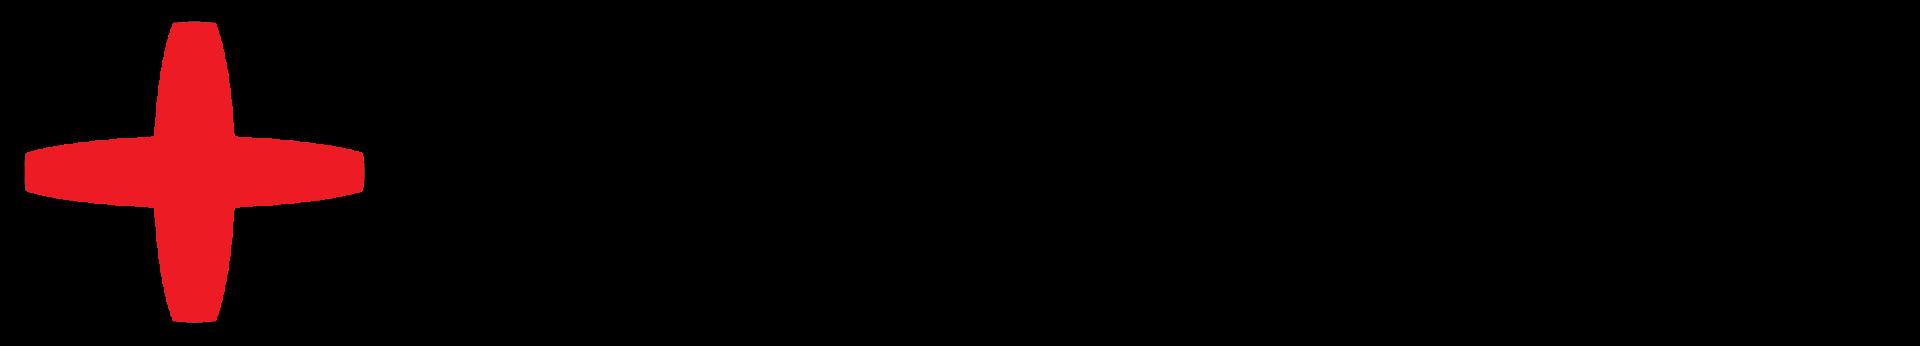 Hakson